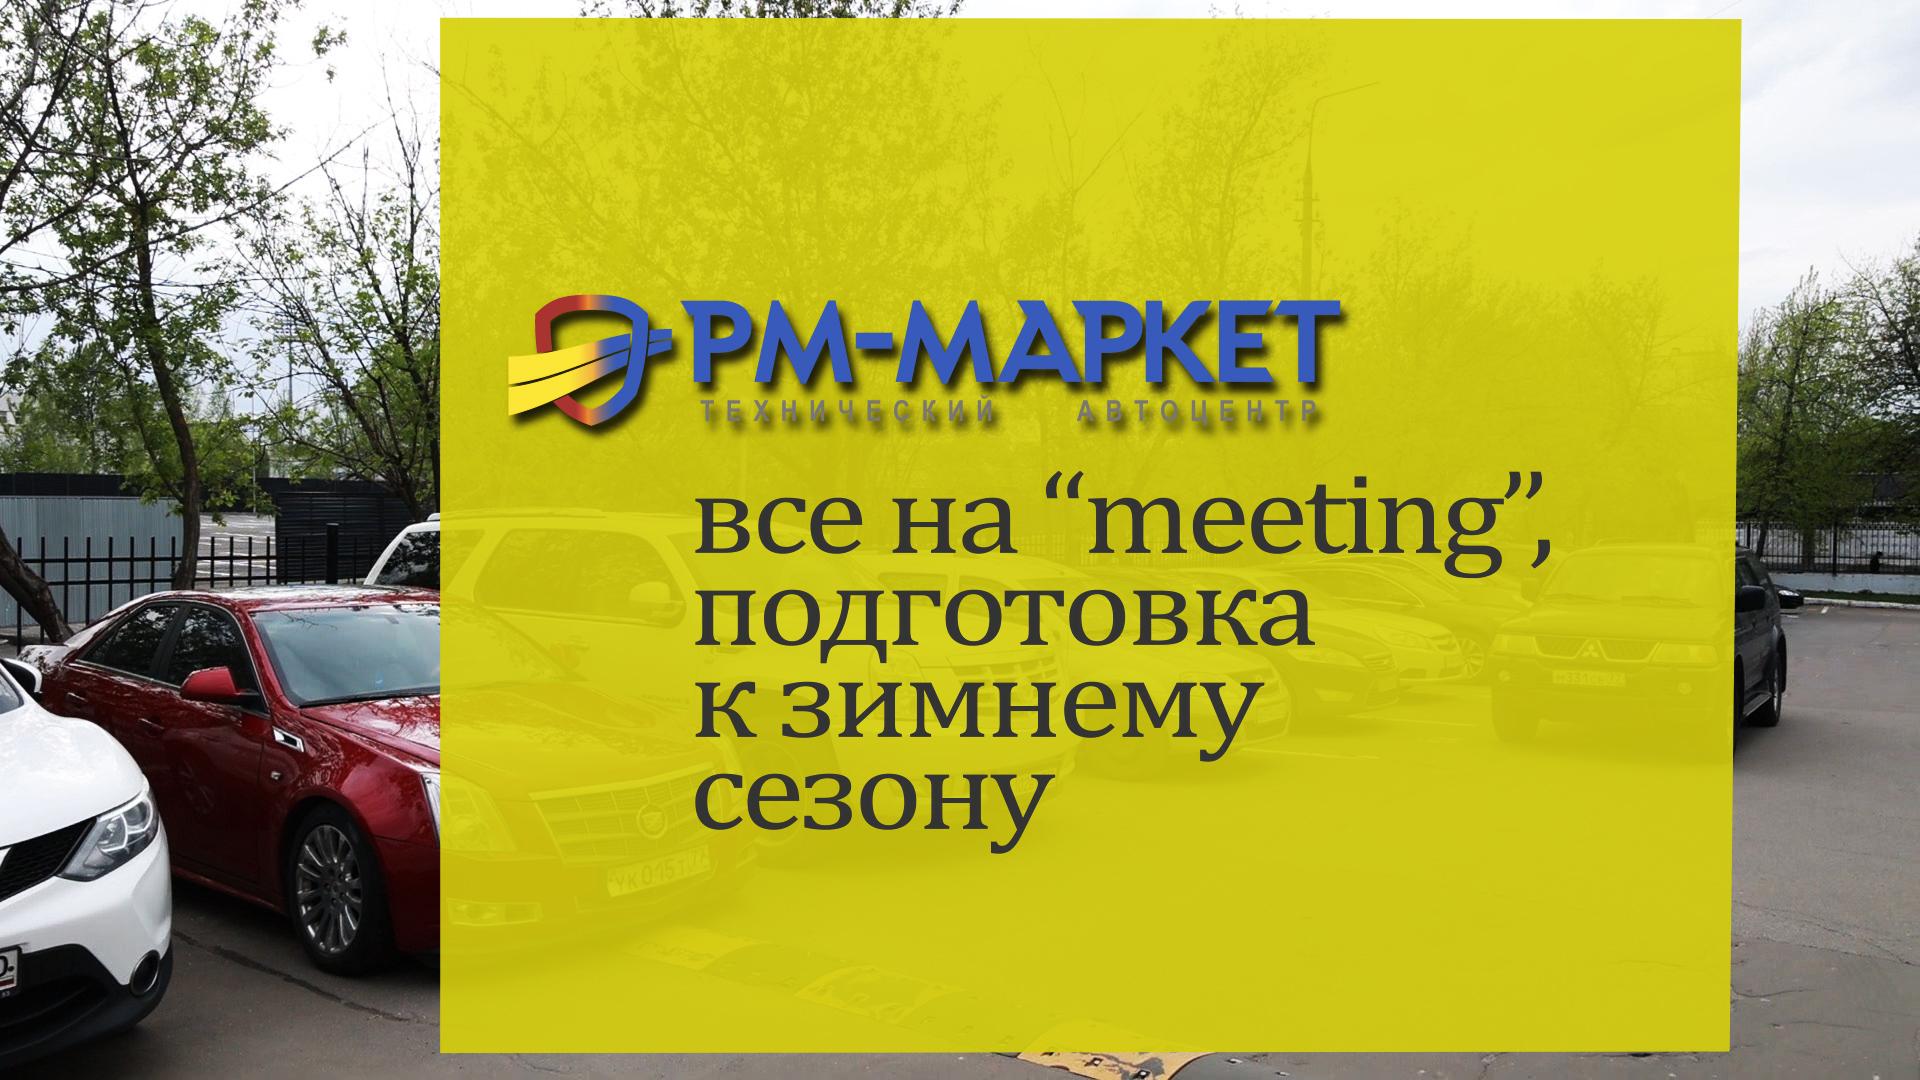 You are currently viewing Все на «MEETING» заберите в RM-market свои скидки и привилегии!